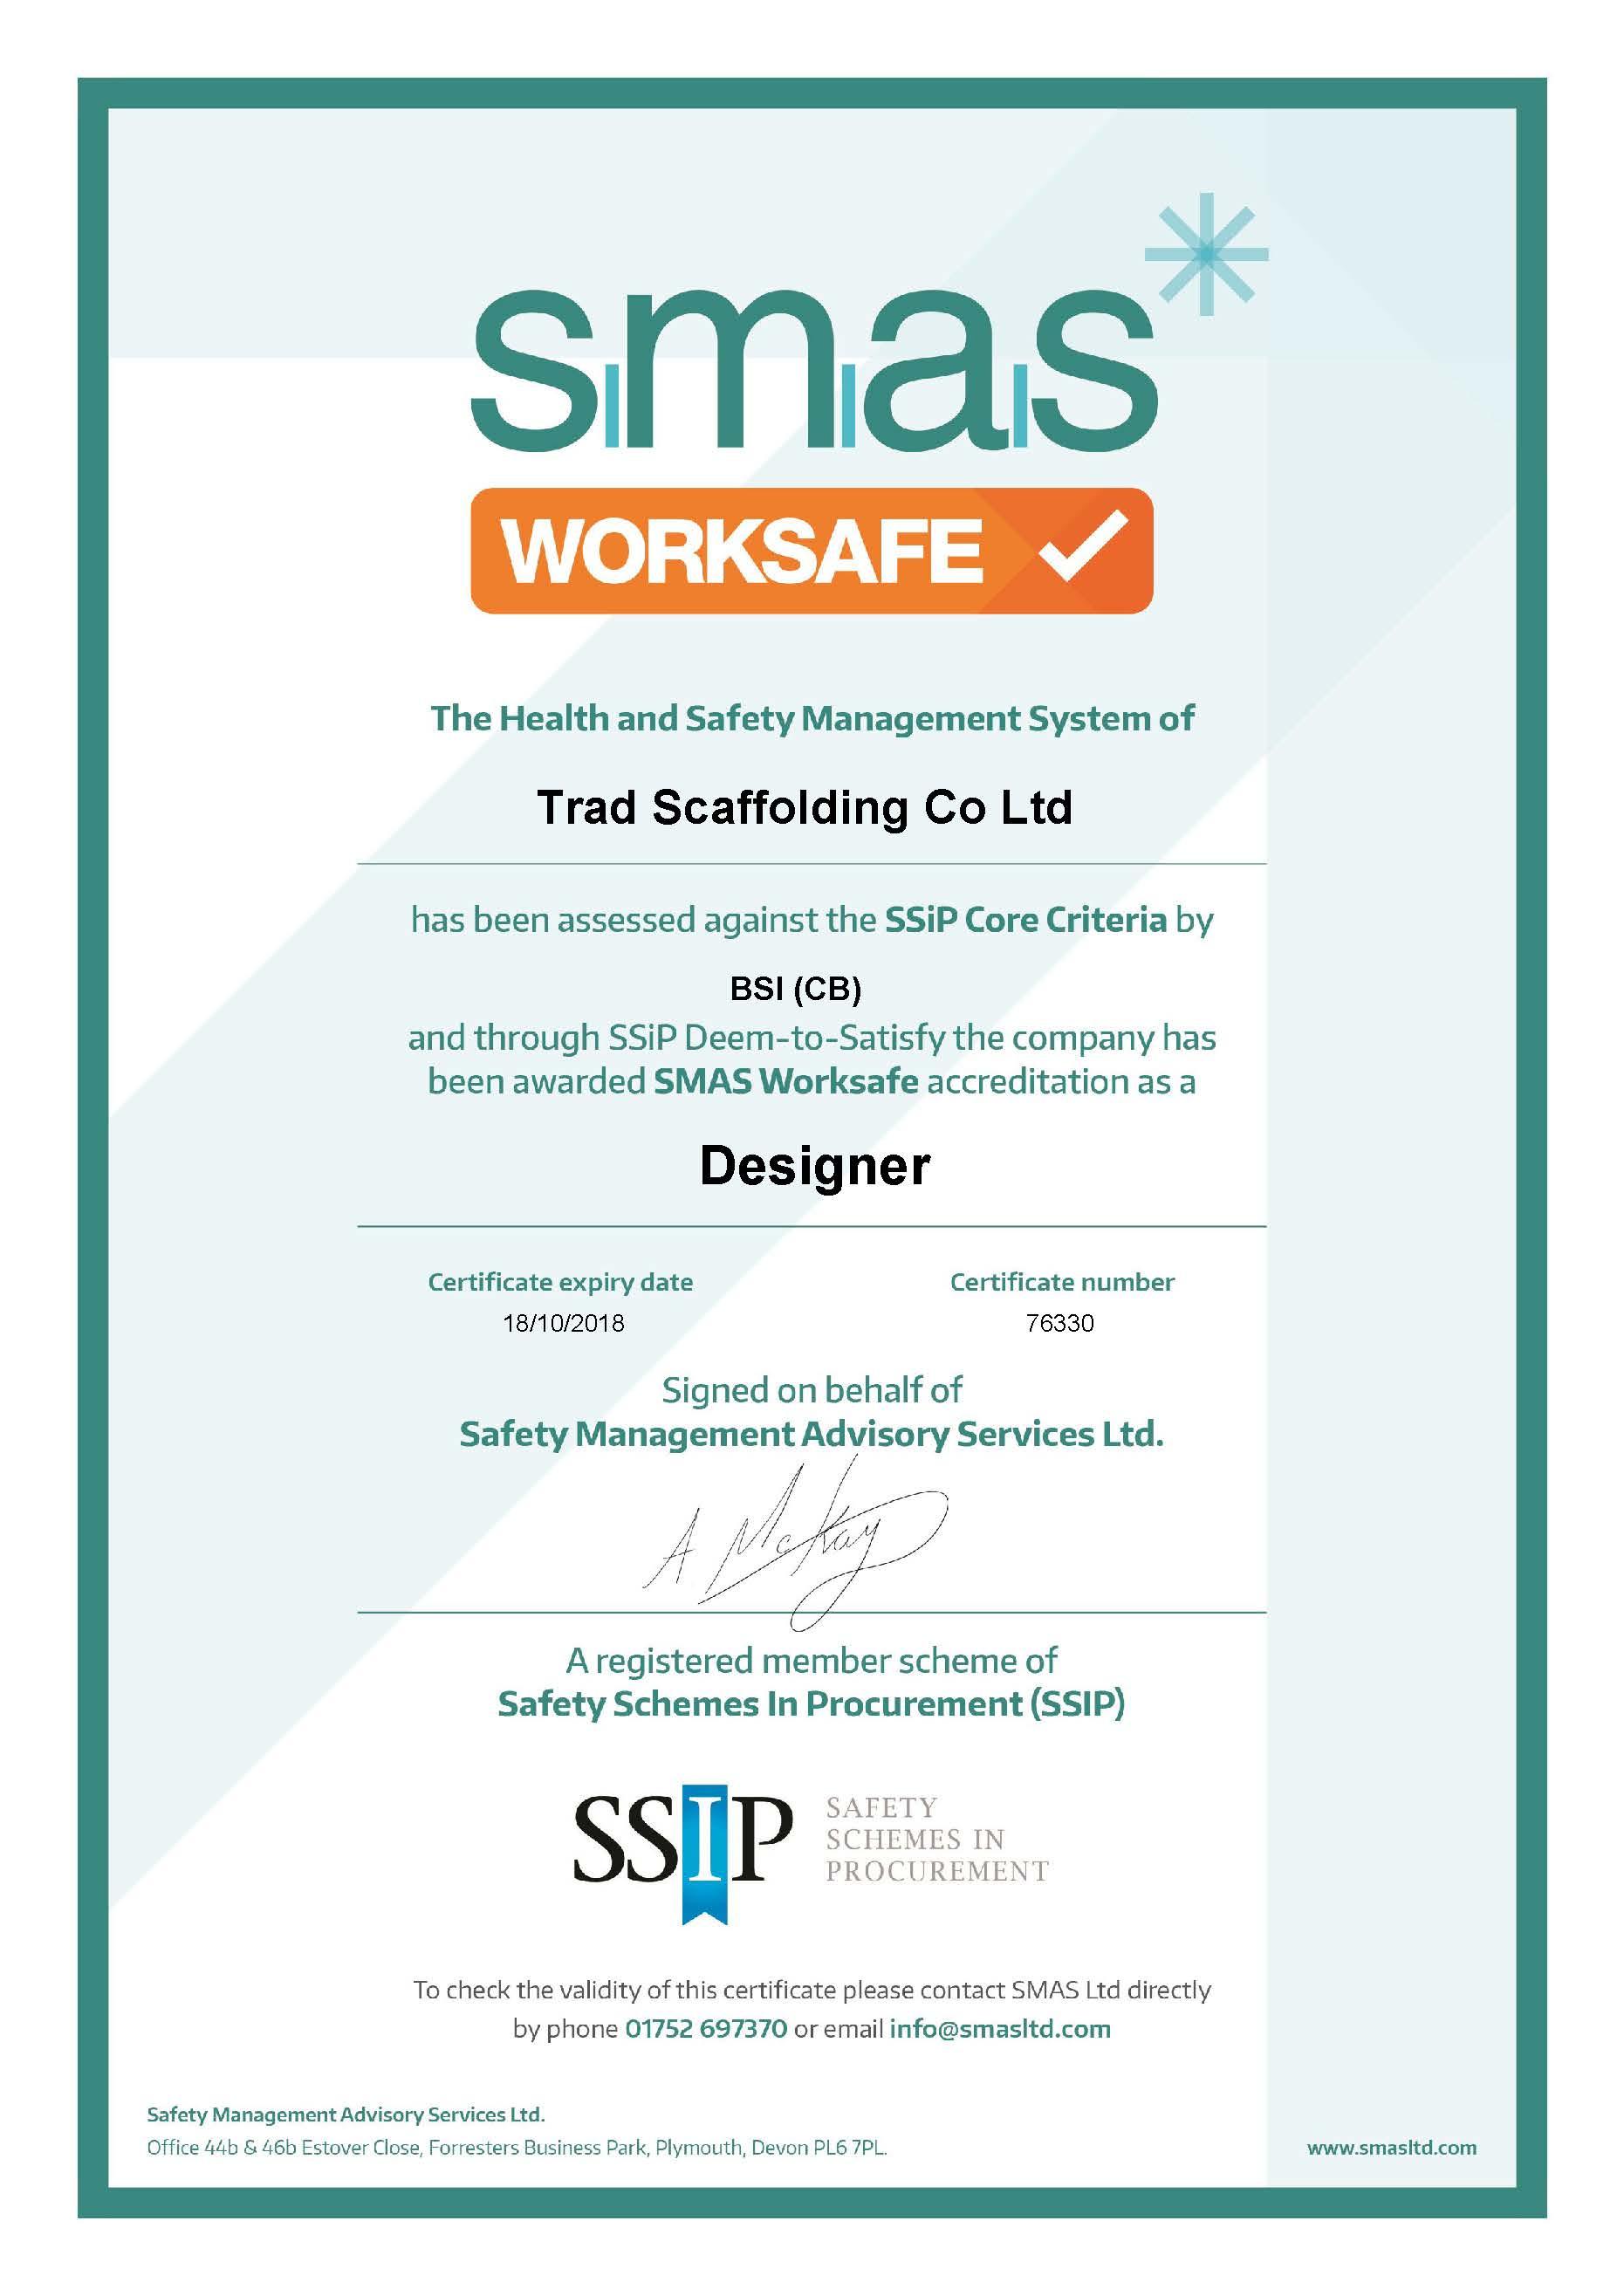 SMAS Worksafe Designer